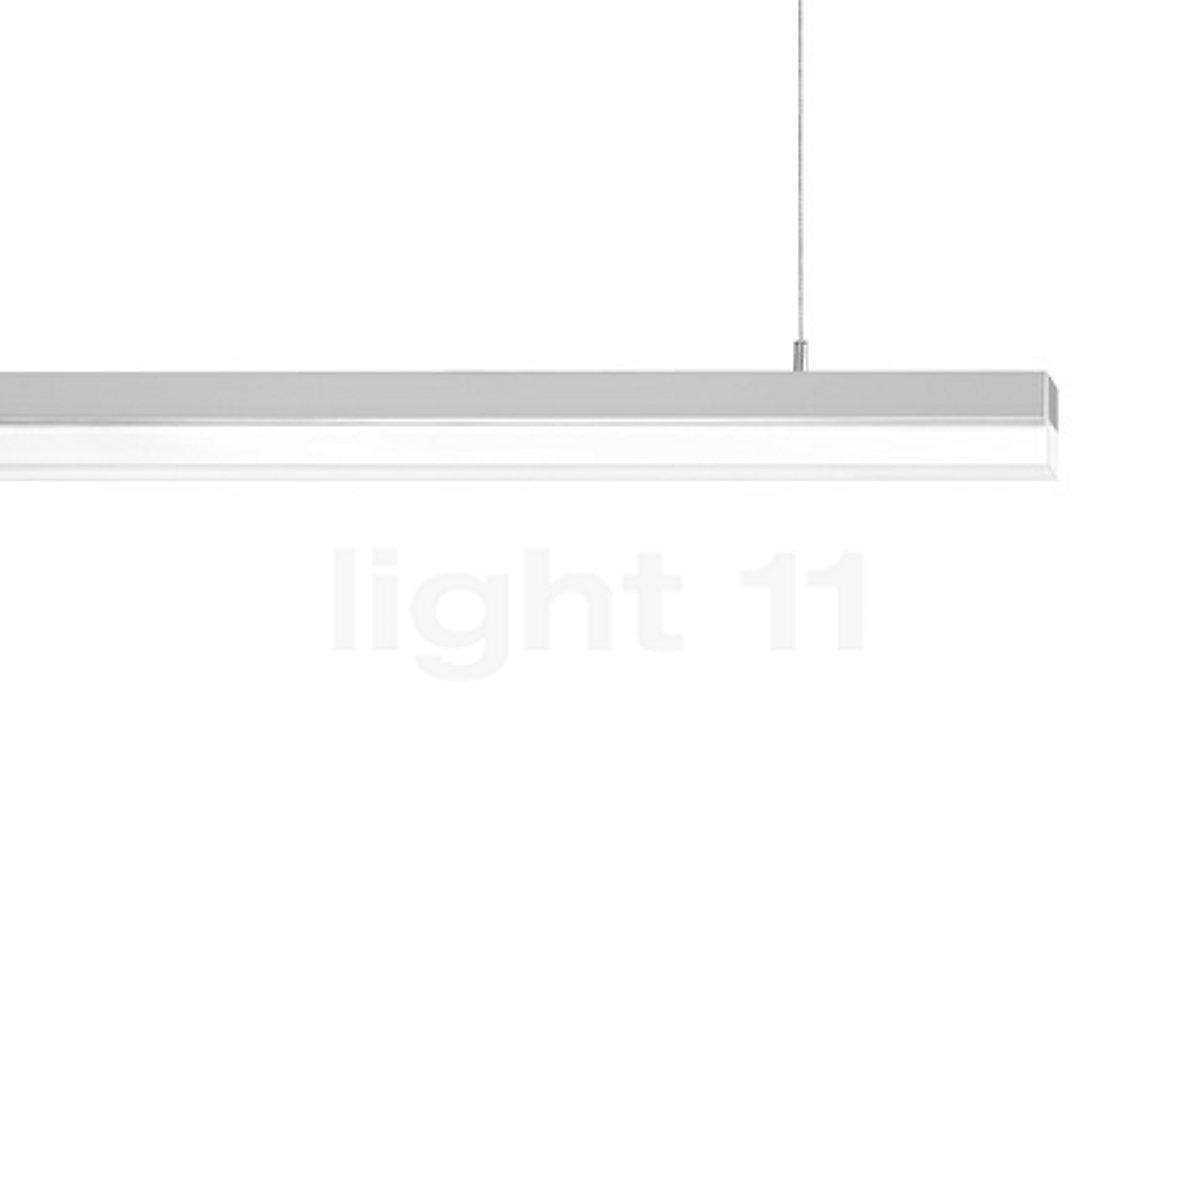 Ribag Licht Spina LED Pendelleuchte schaltbar klarmatt